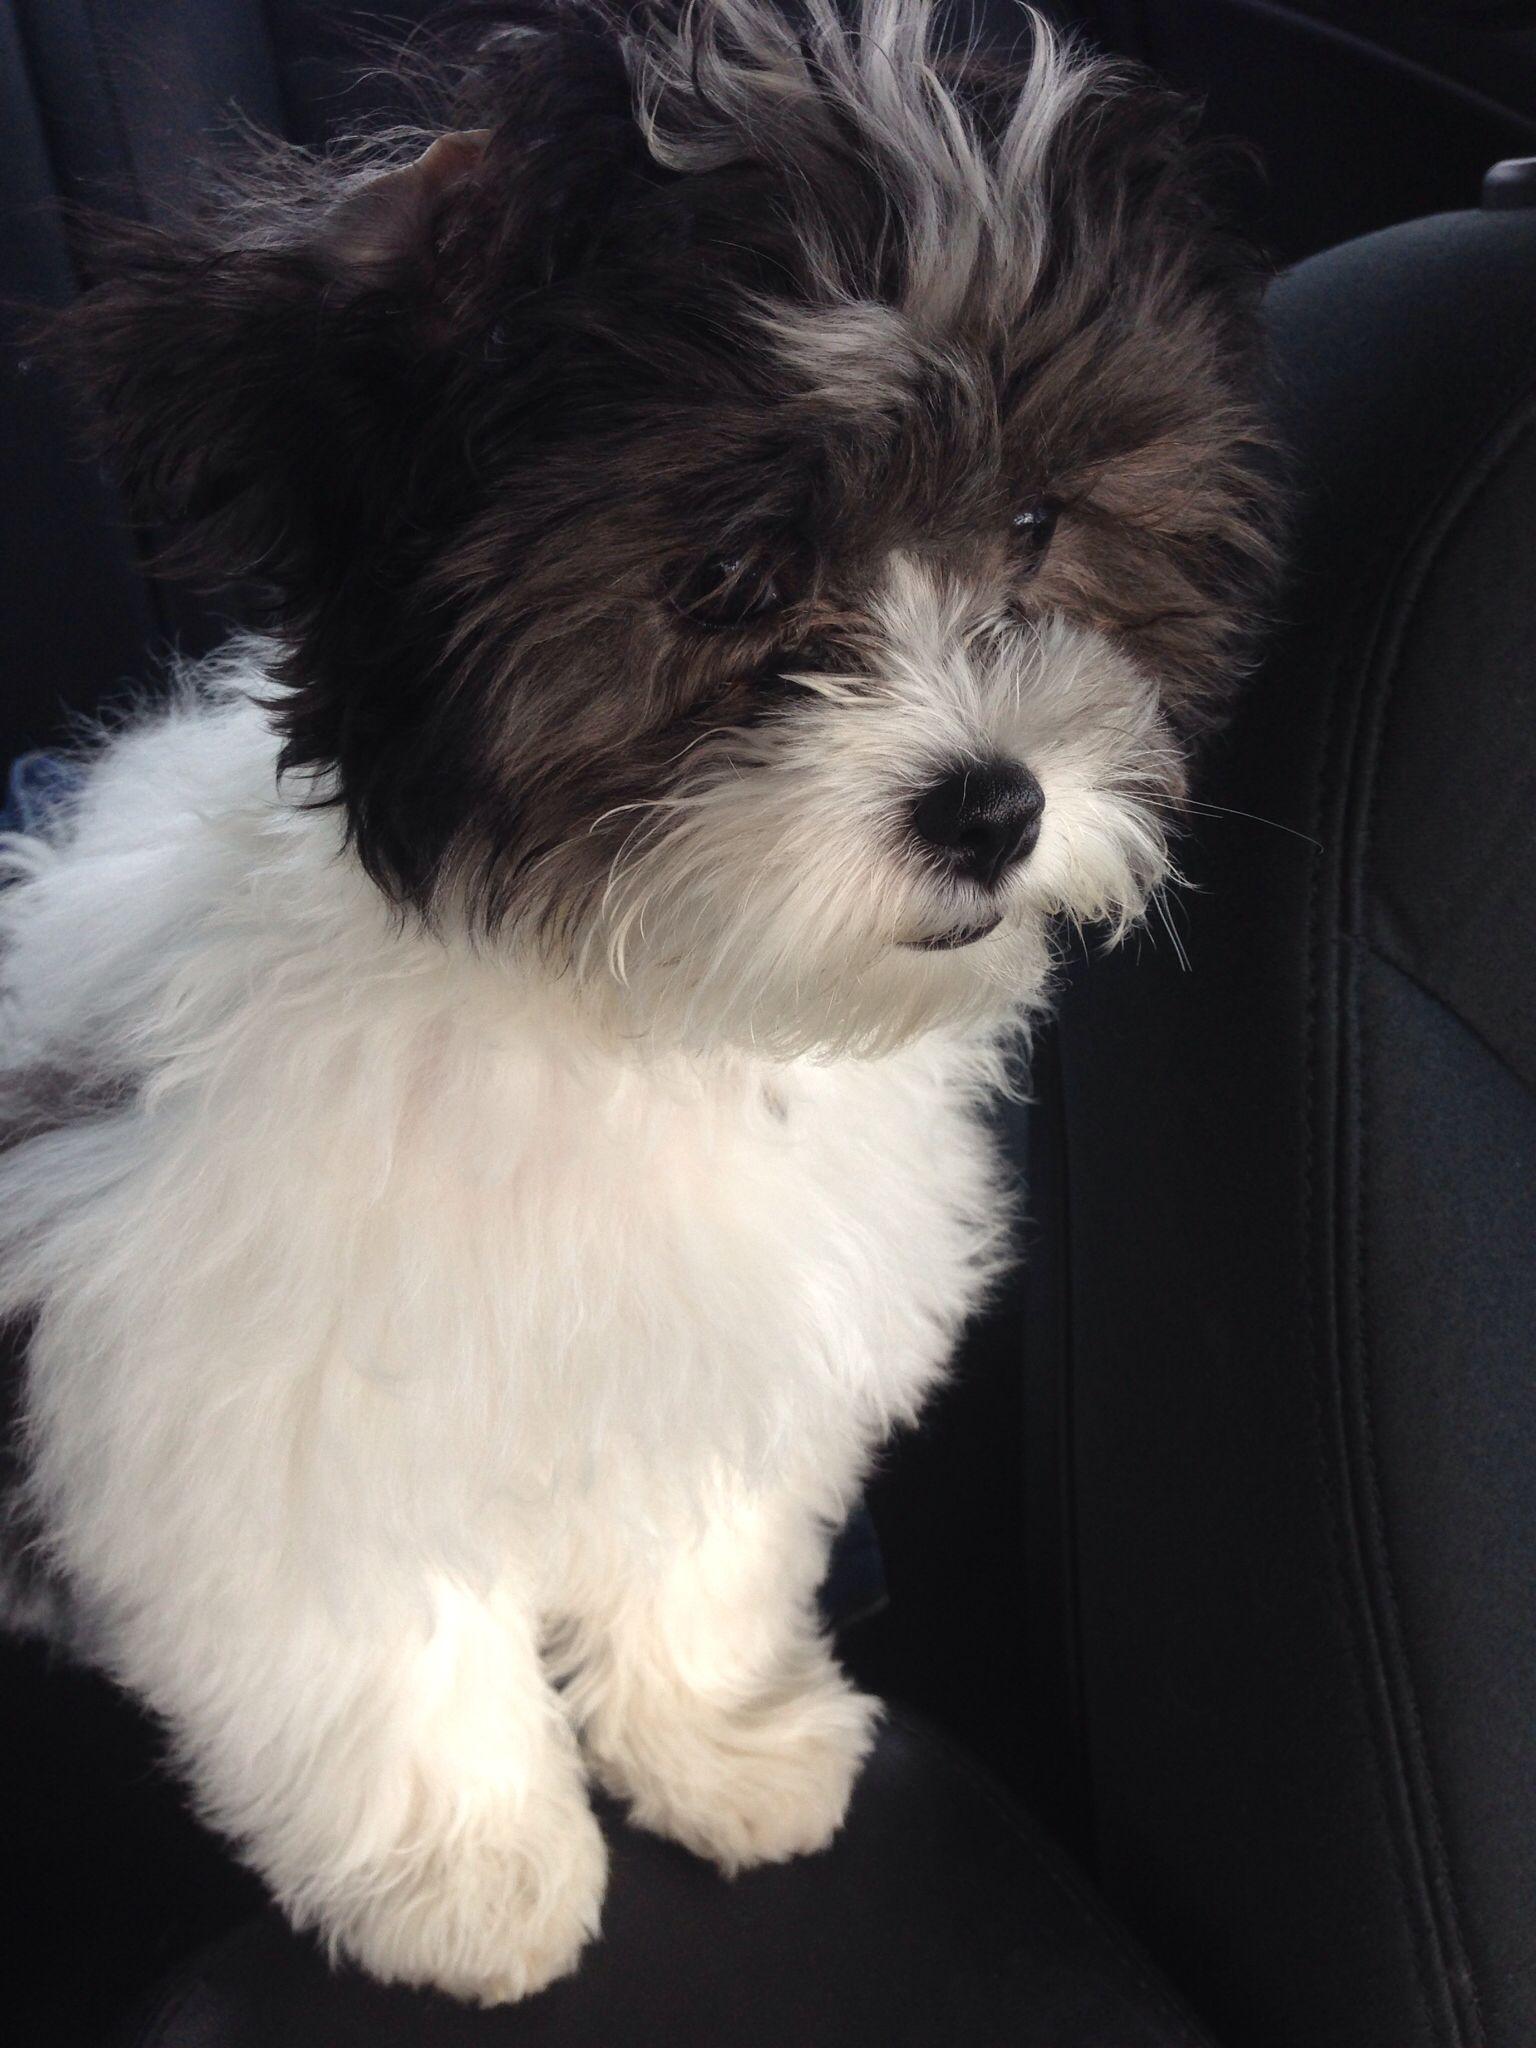 My Beautiful Malshipoo Puppies Cute Animals Cutest Puppy Ever